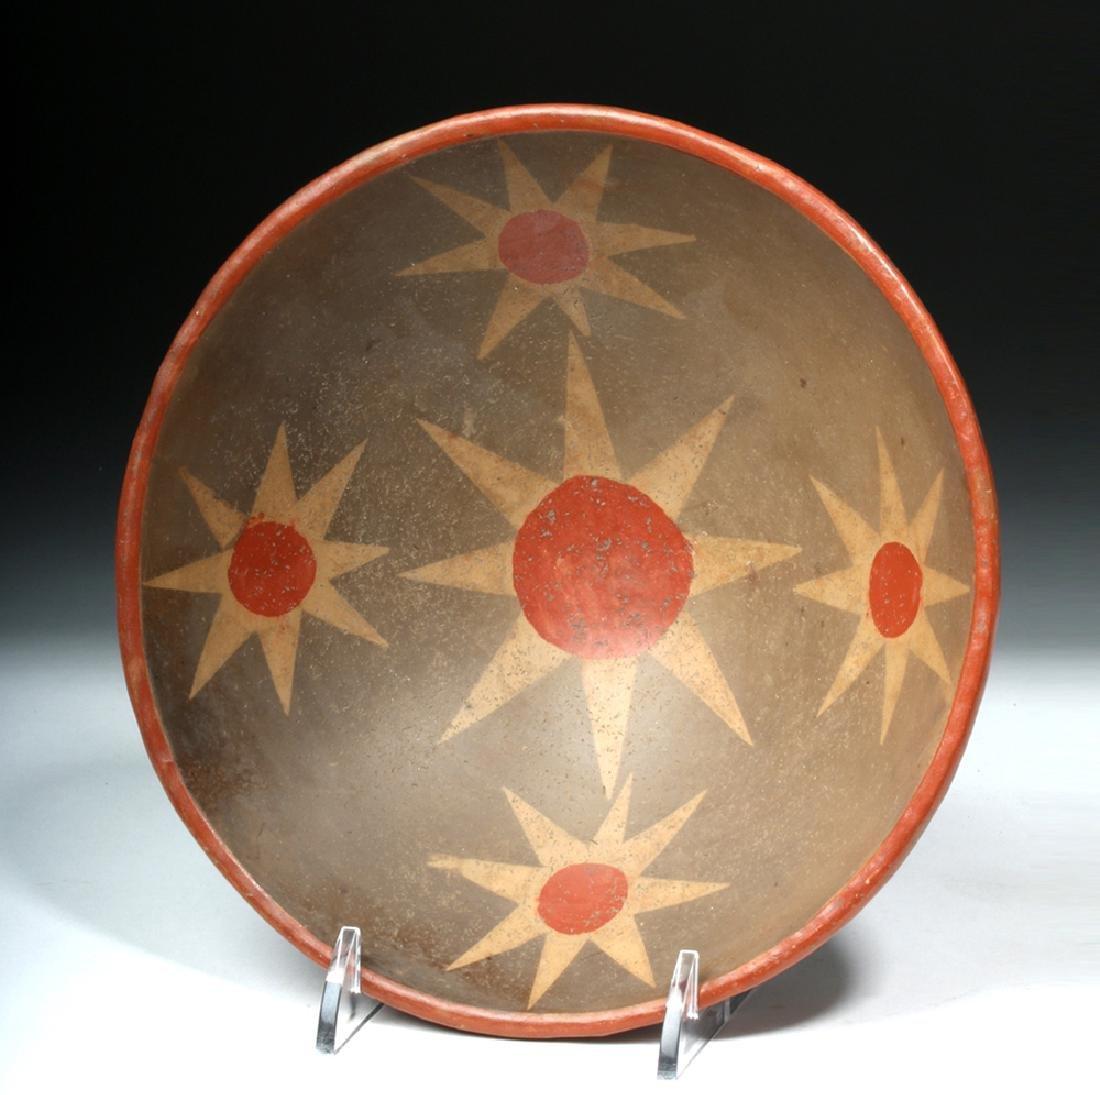 Narino Polychrome Bowl - 8 Pointed Stars Motif